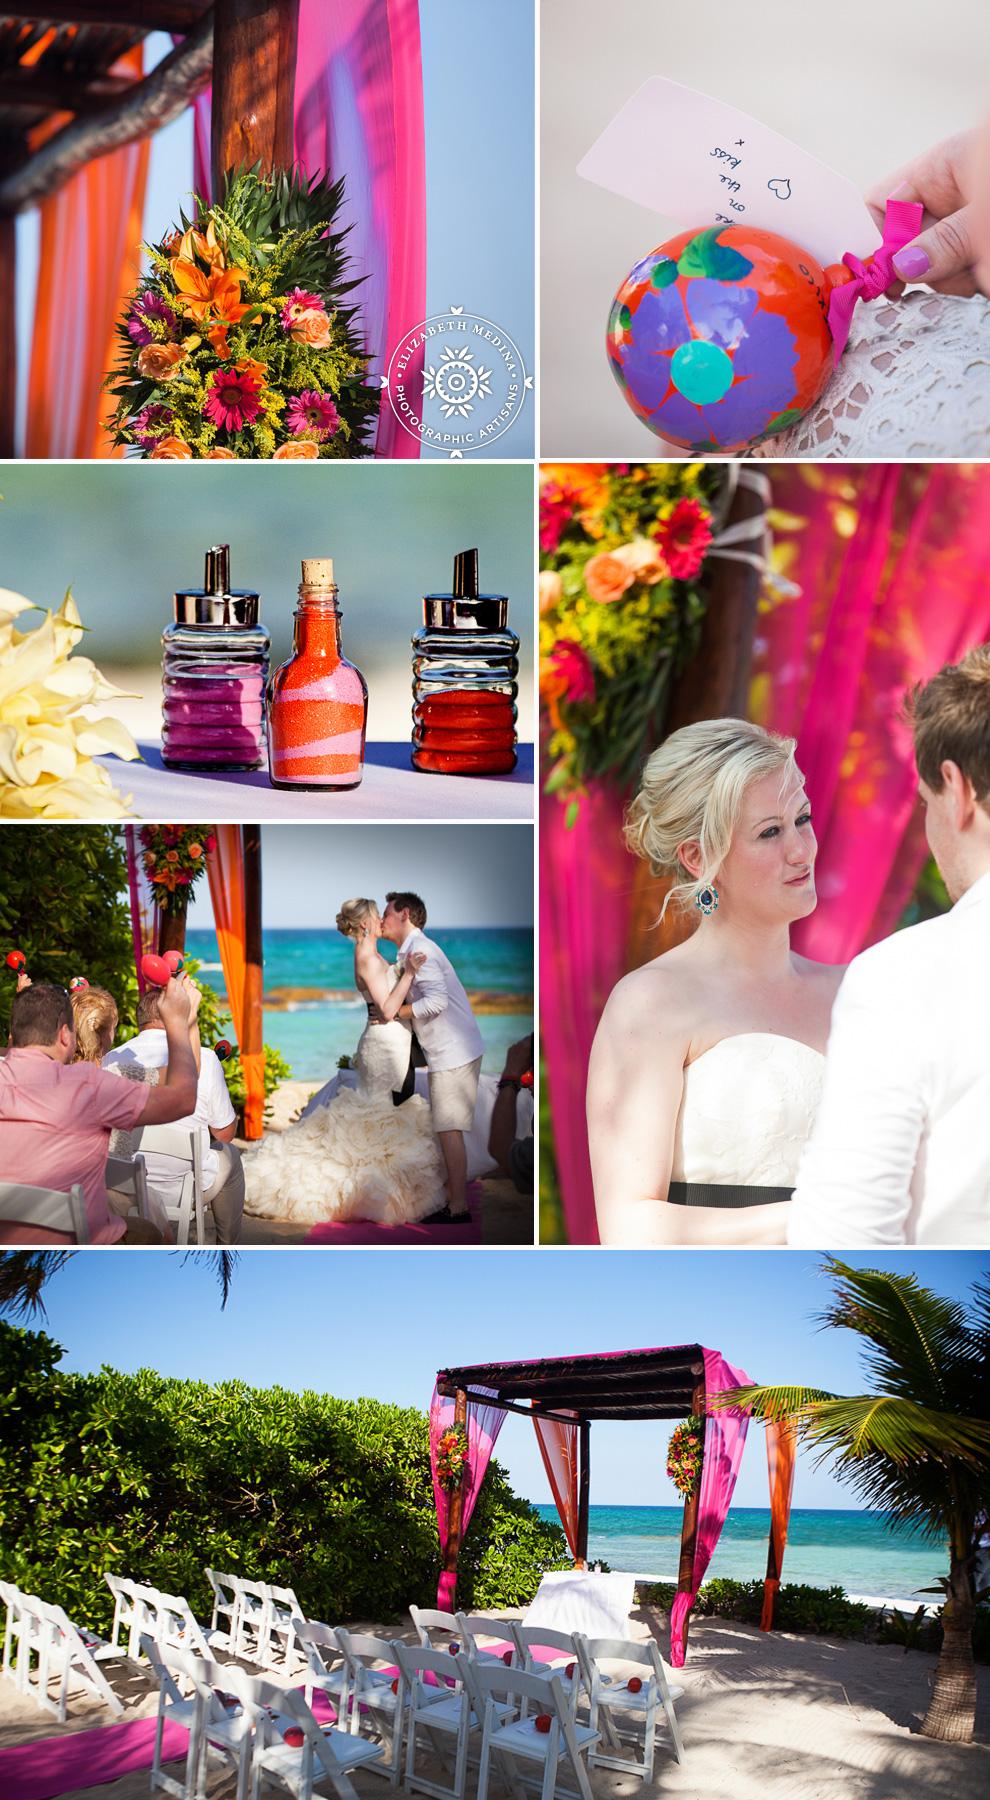 el_dorado_royale_wedding_photographer_mexico_emedina_020 El Dorado Royale Wedding Photography, Becky and Ant's Destination Wedding   04 15 2014